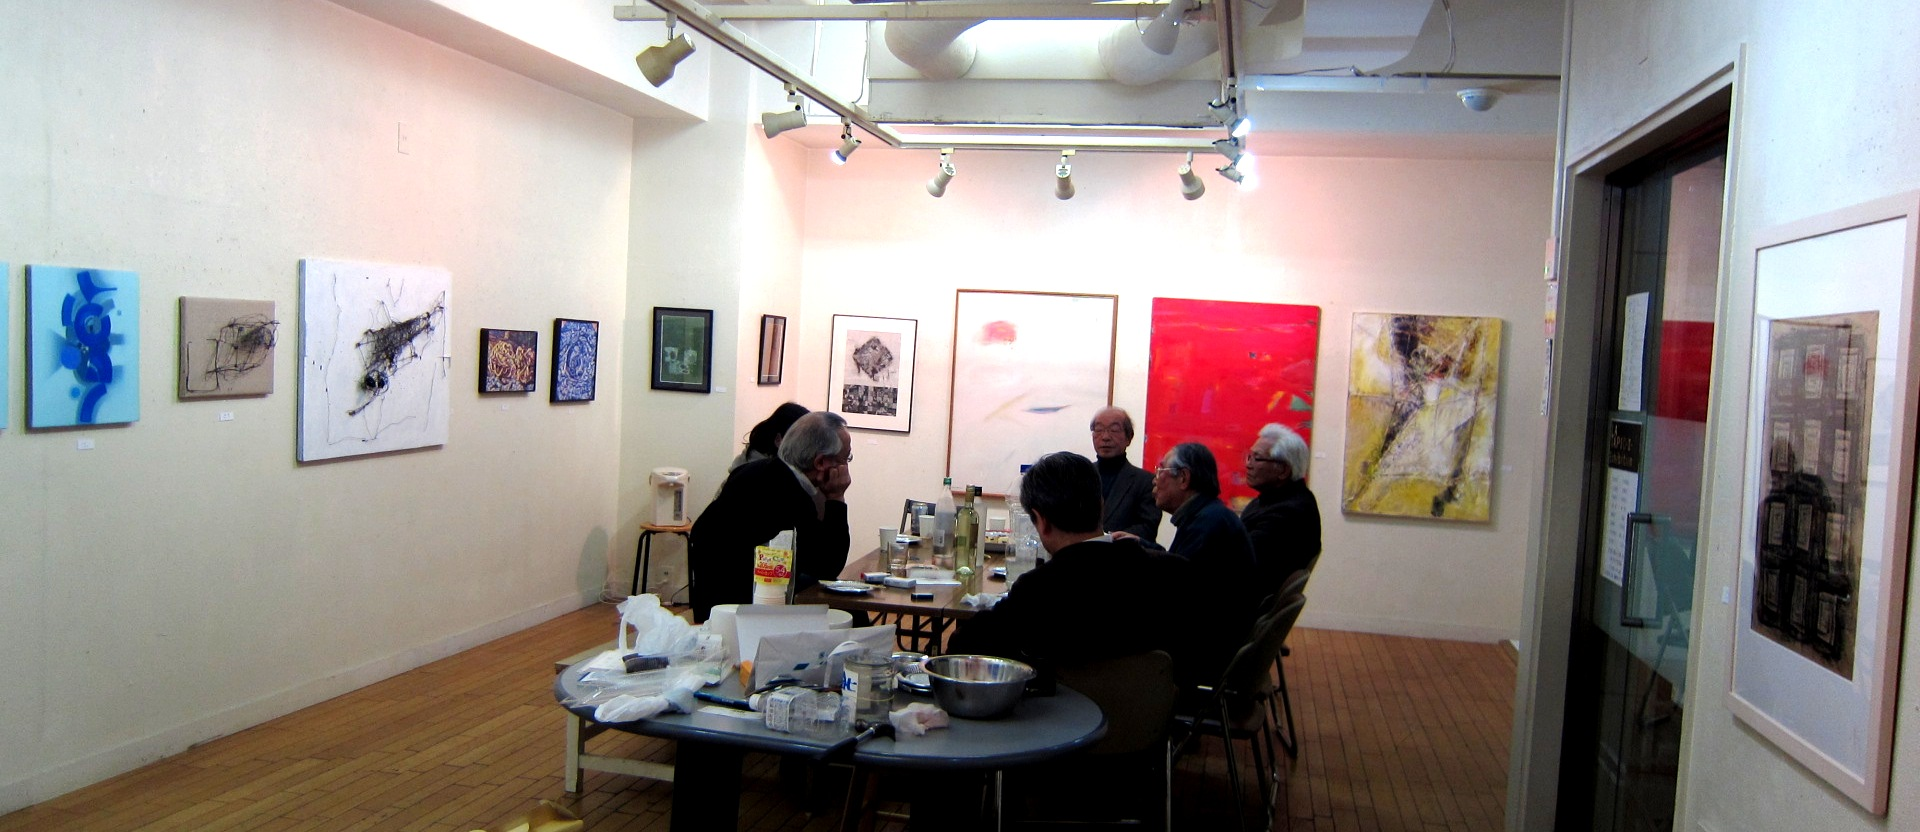 2354) 「LA`TAPIO -Ⅱ- Exhibition」 たぴお 1月27日(月)~2月15日(土)_f0126829_921026.jpg